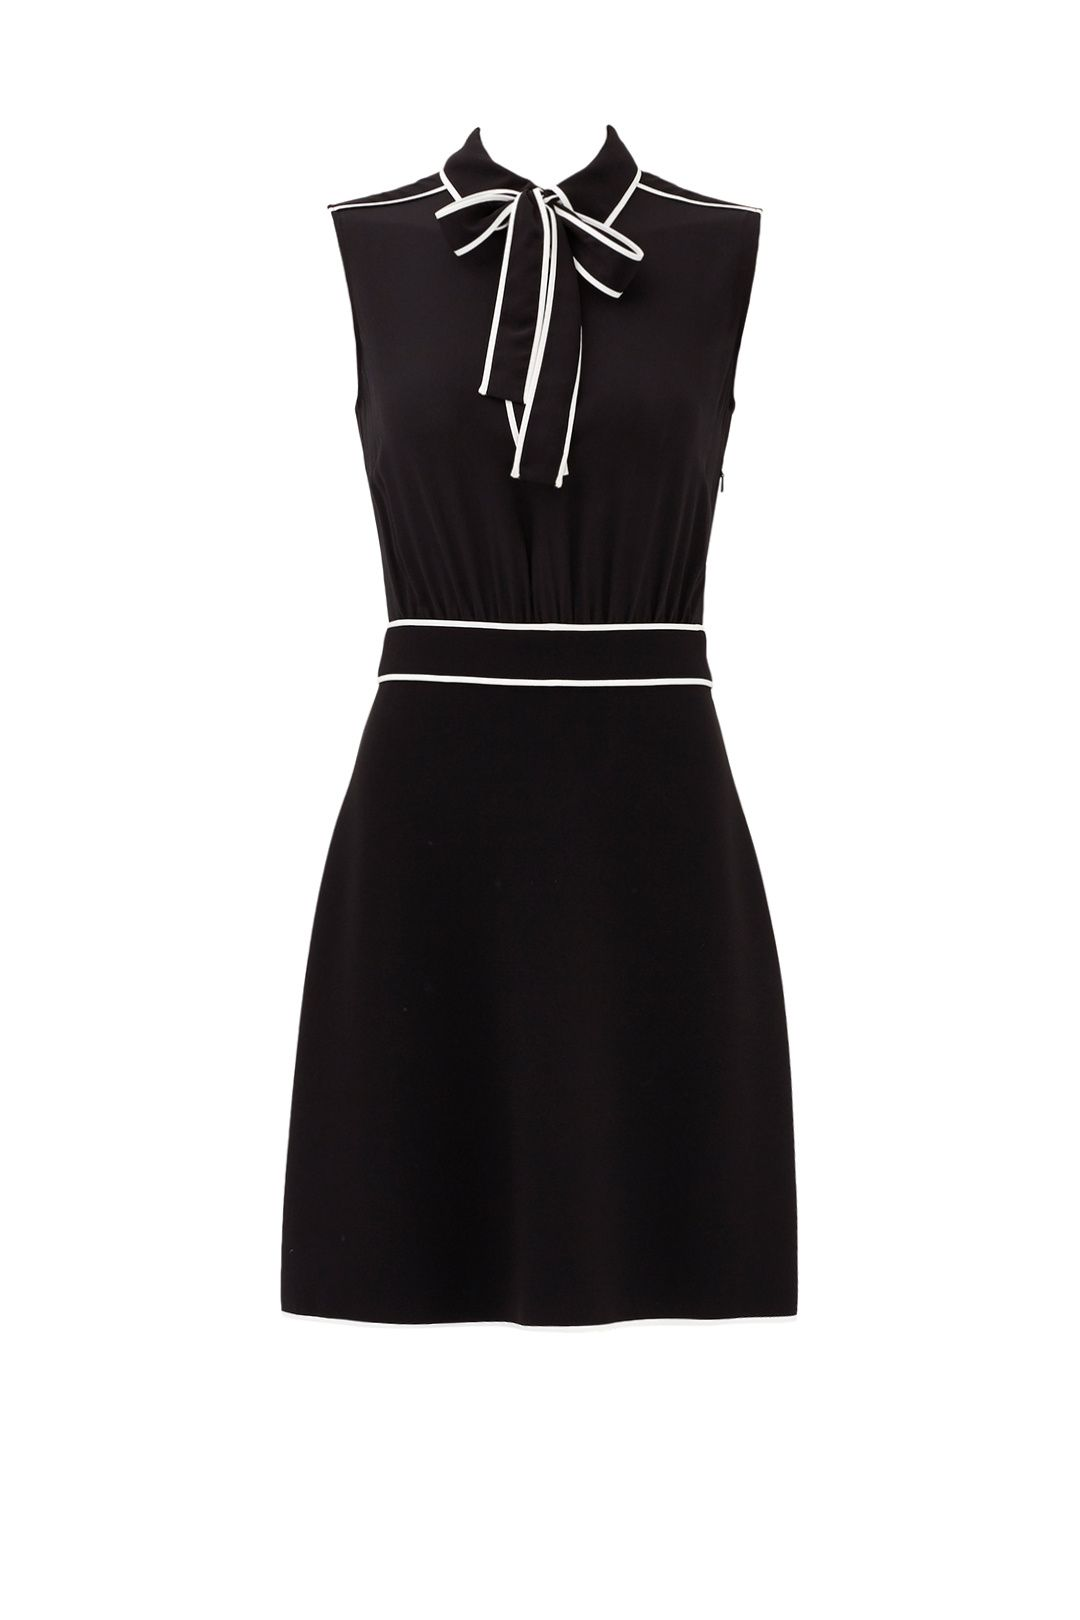 Boutique Moschino Black Bow Tie Dress Corporate Dress Dresses Bow Tie Dress